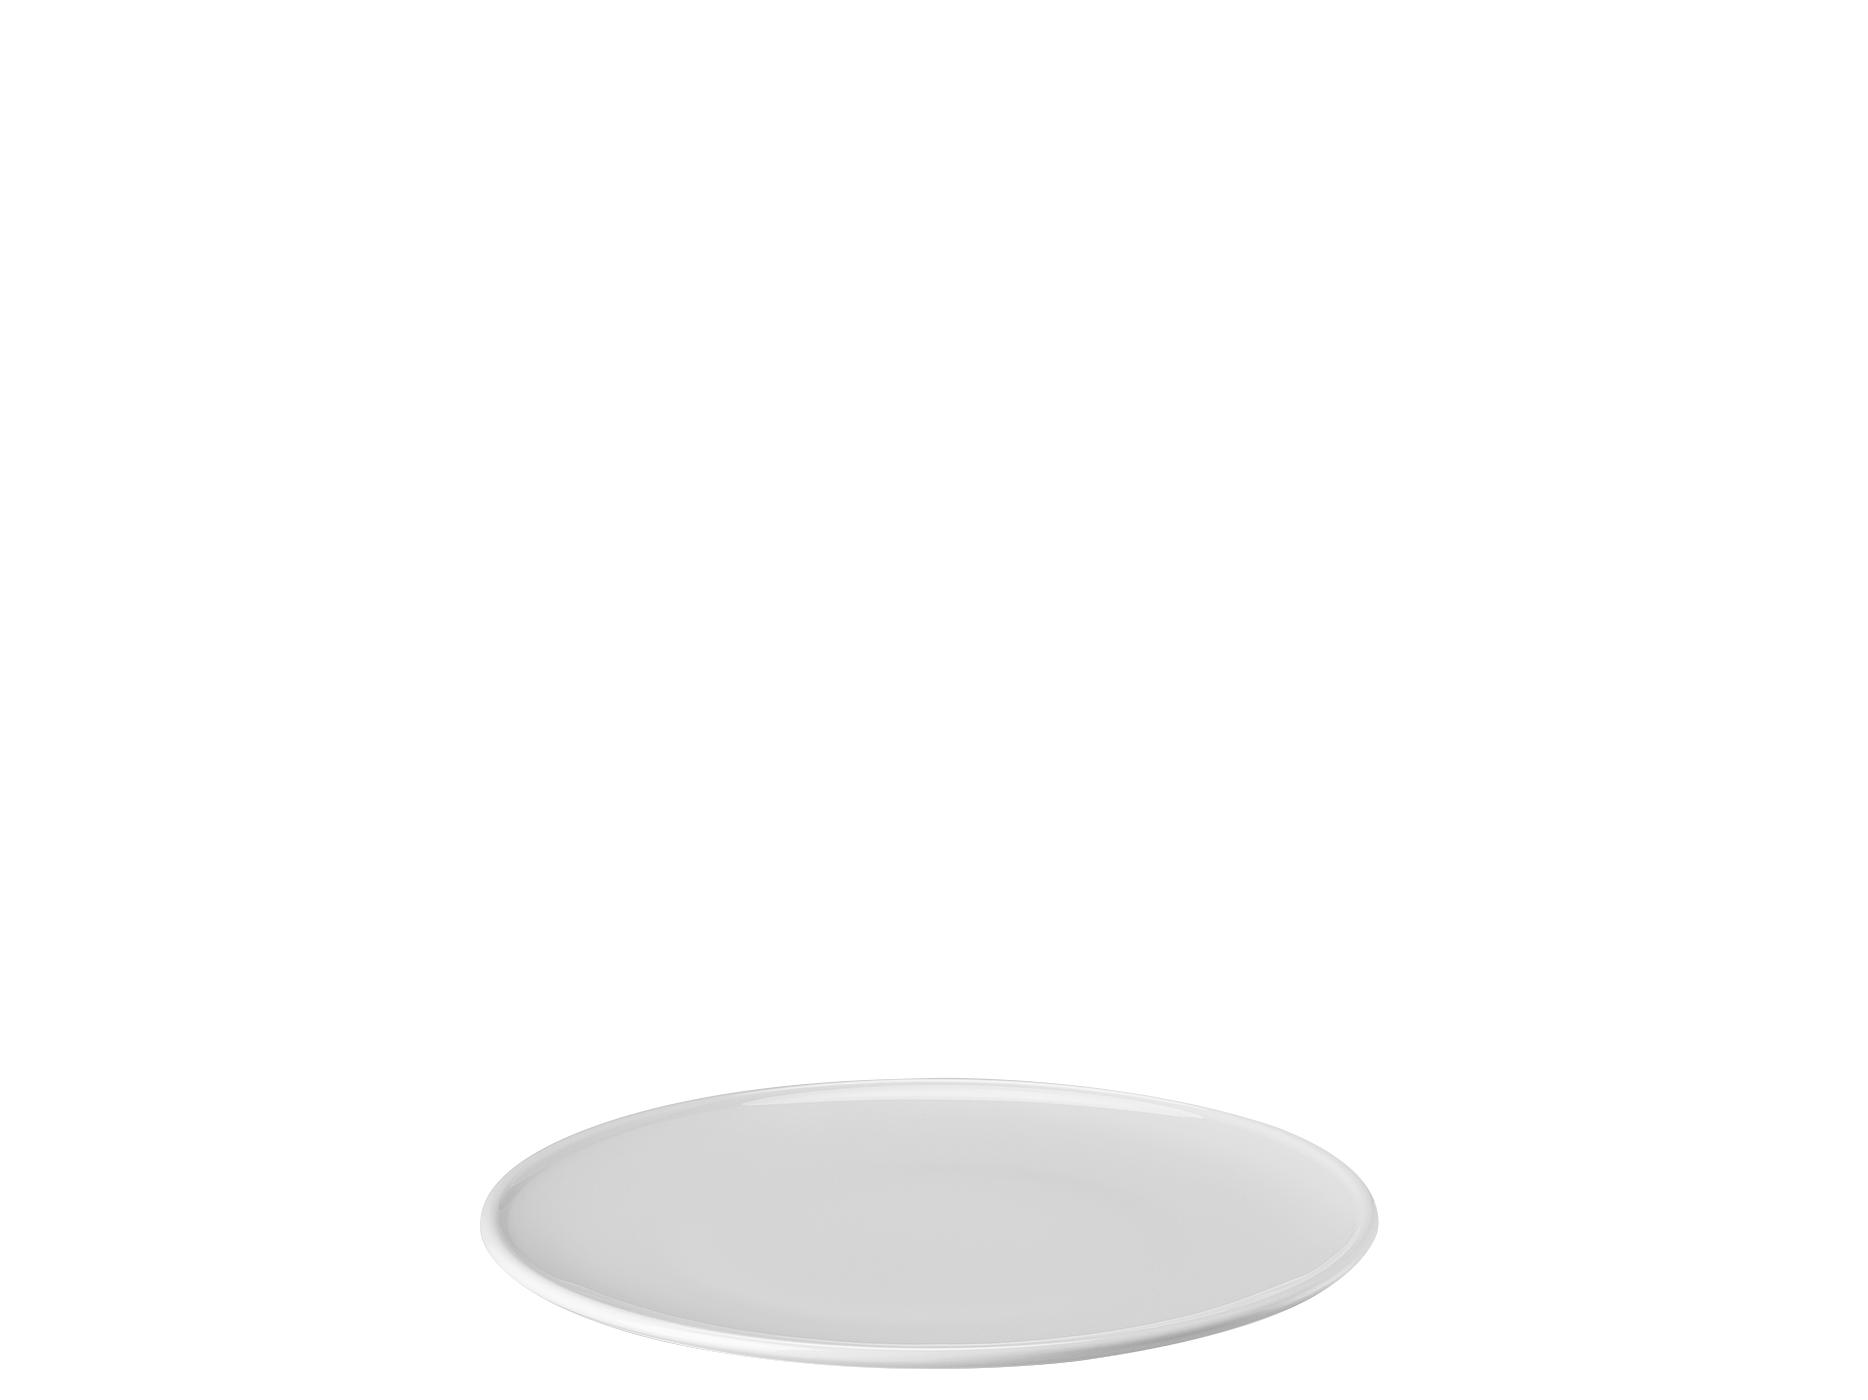 Teller flach glattPlate flat plain[Französisch] Piatto piano